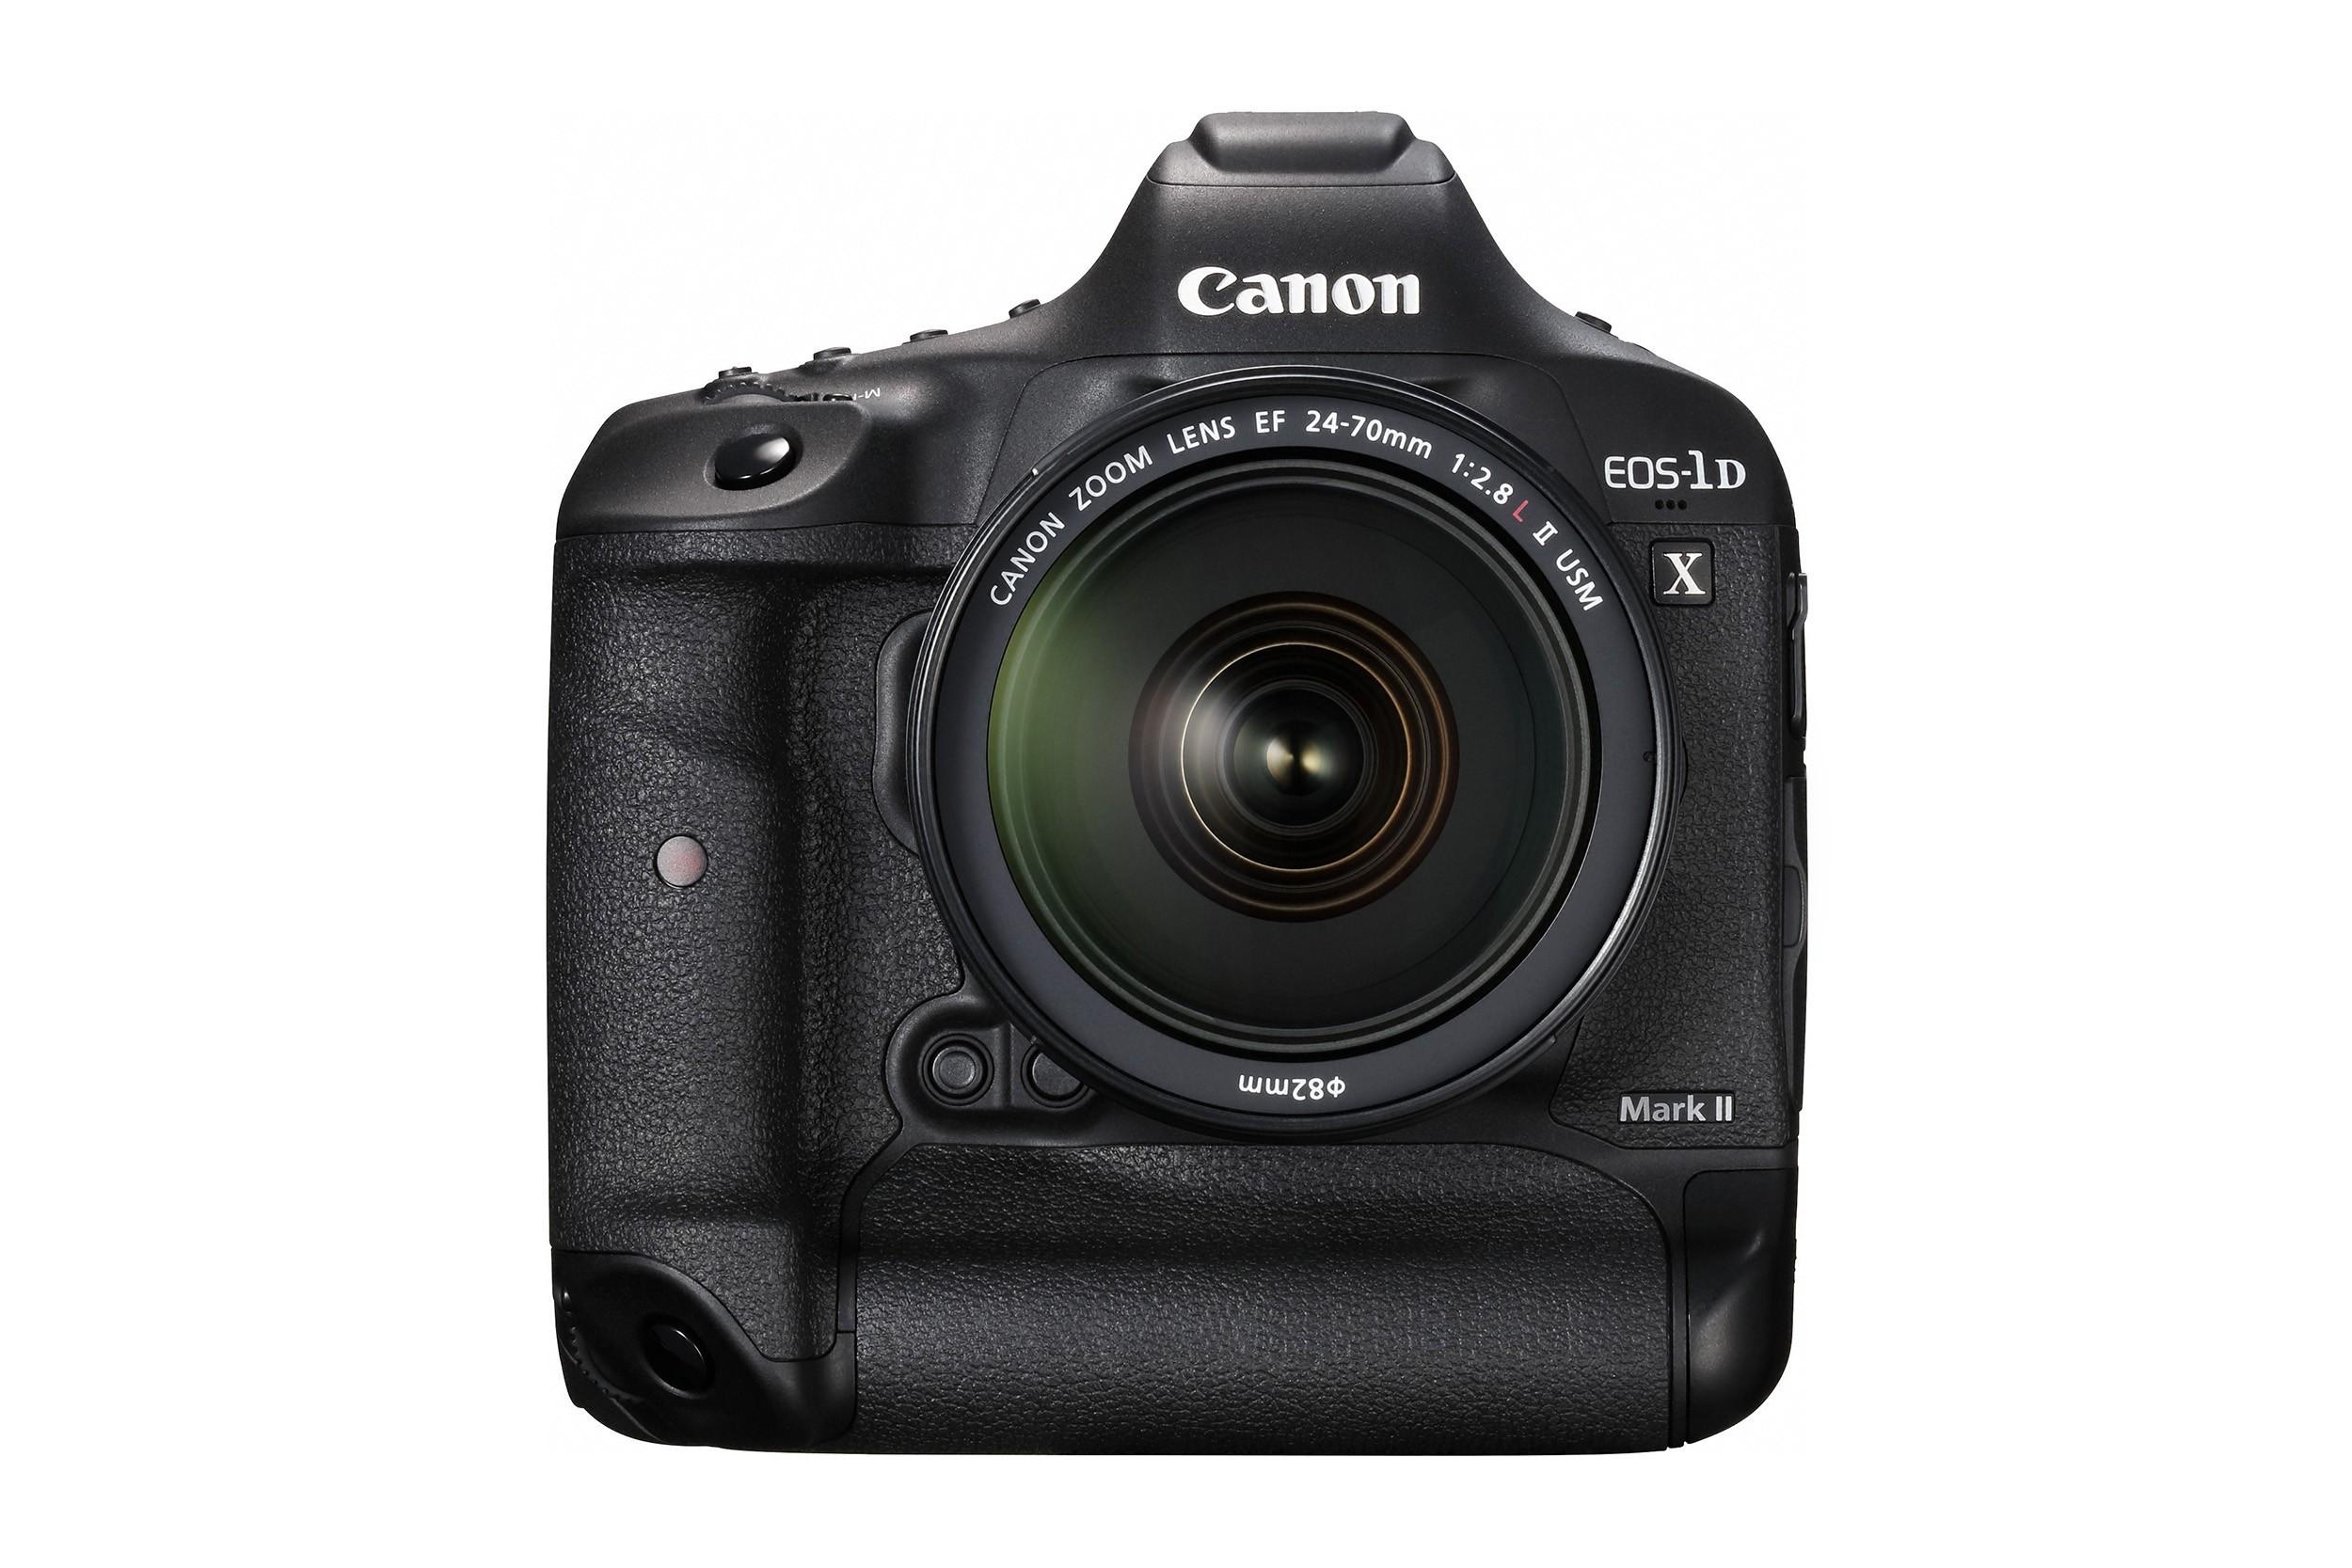 Canon EOS-1D X Mark II - Rp 79 juta